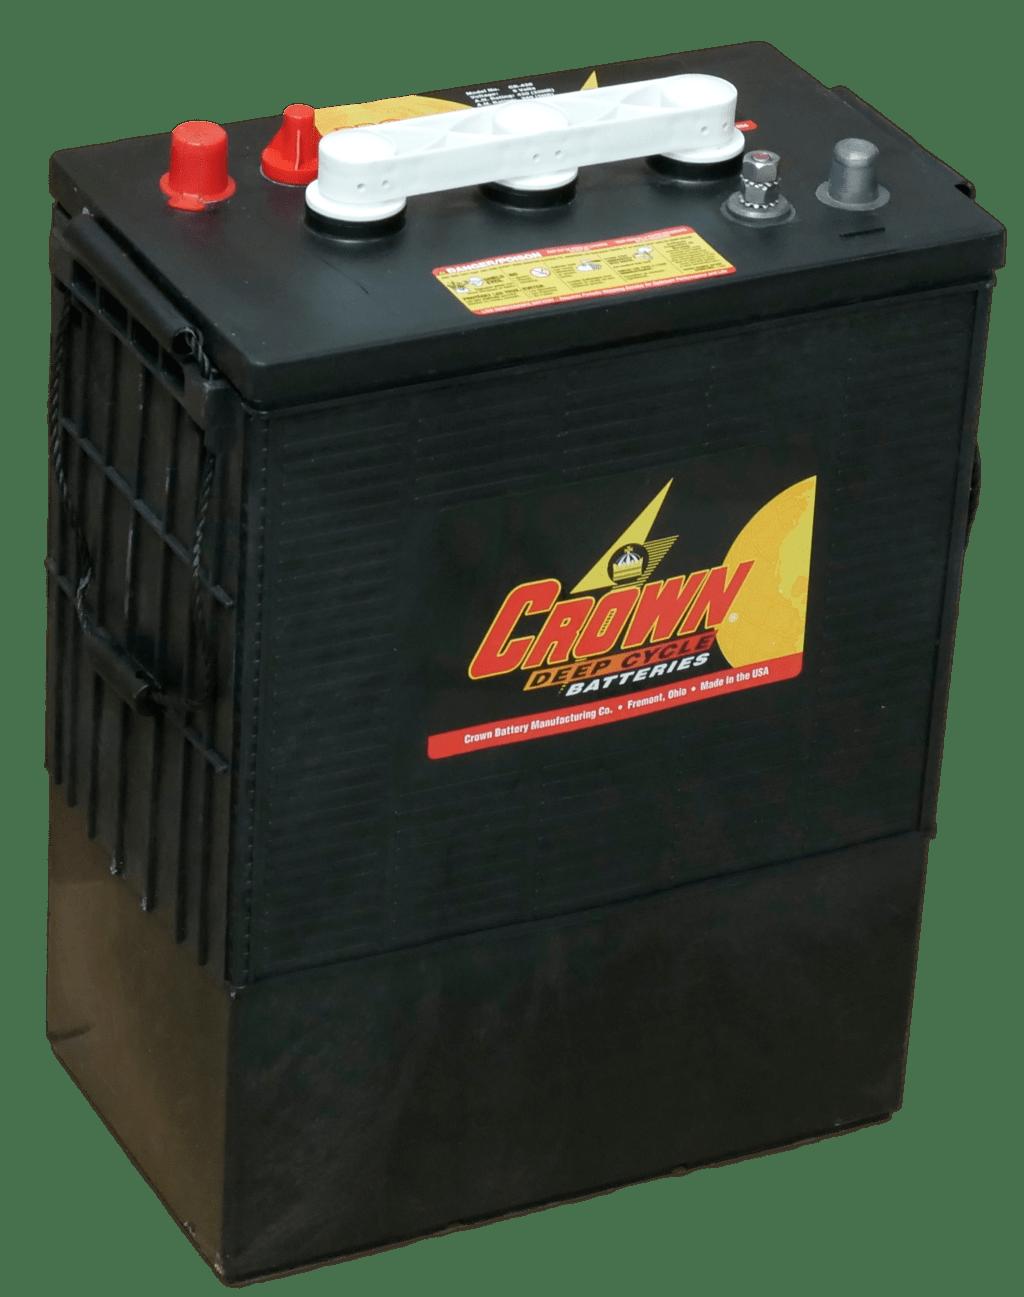 Crown 860AH 48VDC 41,280 Wh (16) Battery Bank